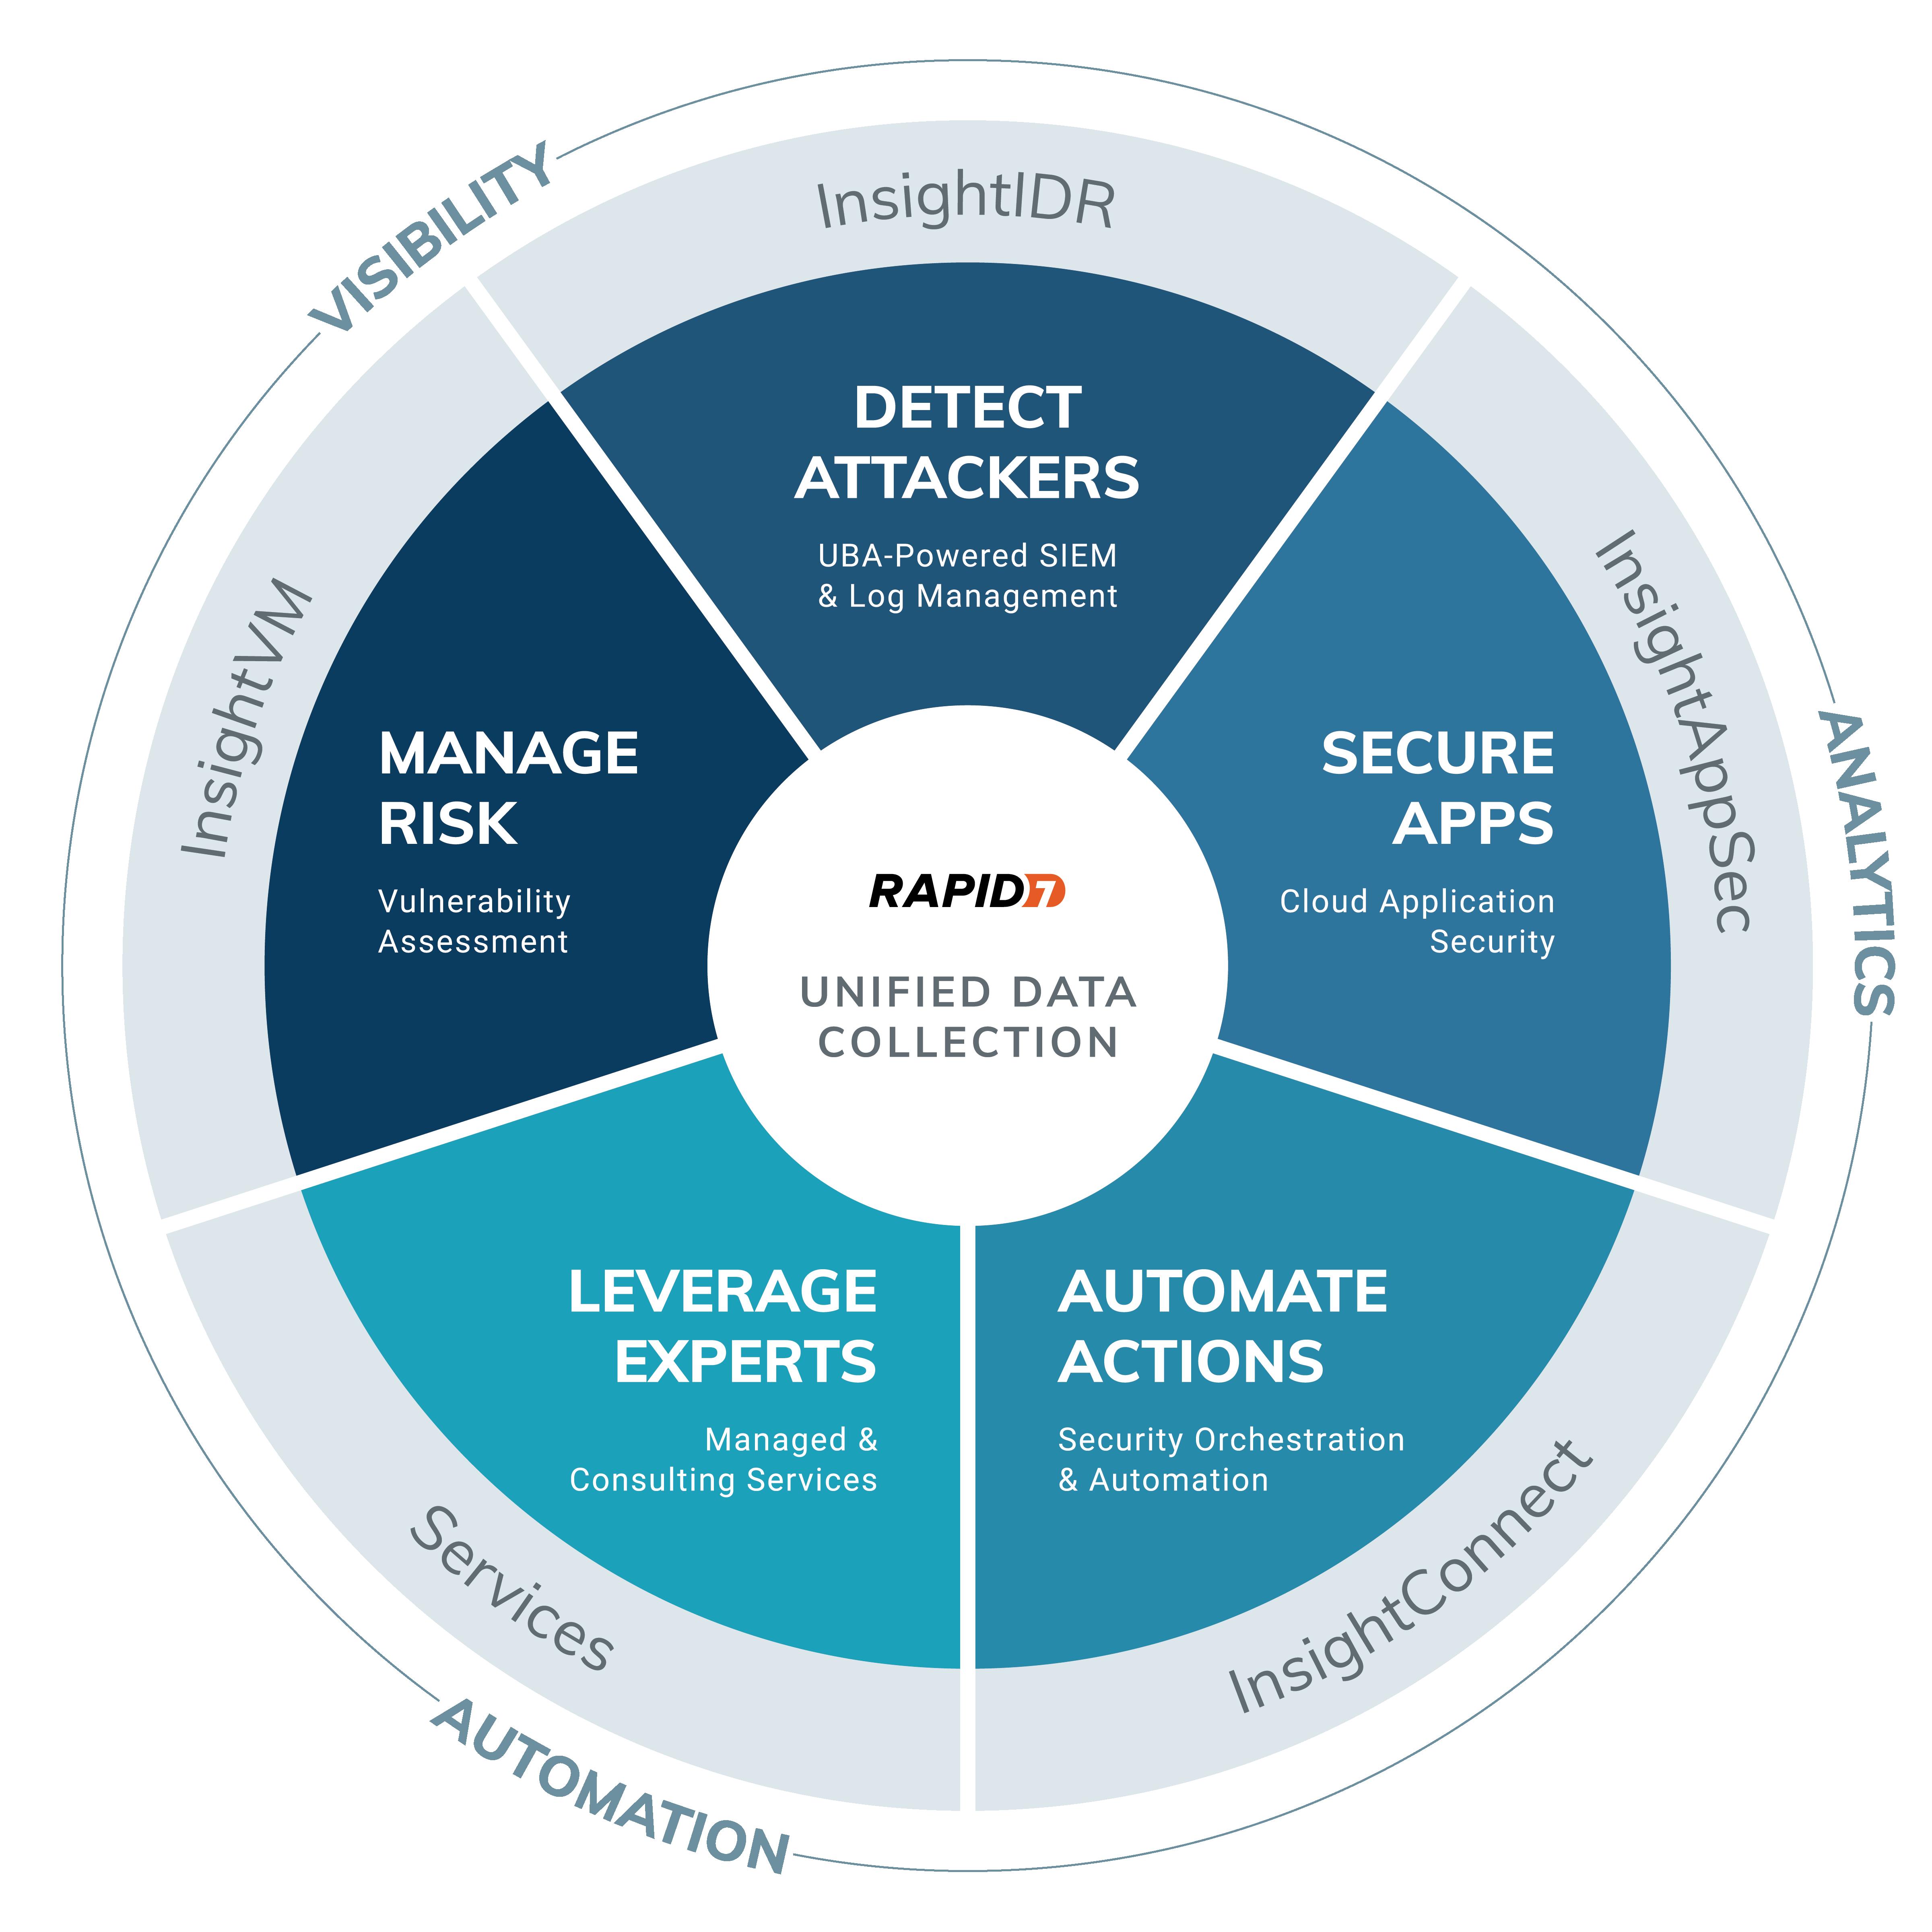 Rapid7 Cloud Security Solutions: The Insight Cloud Platform